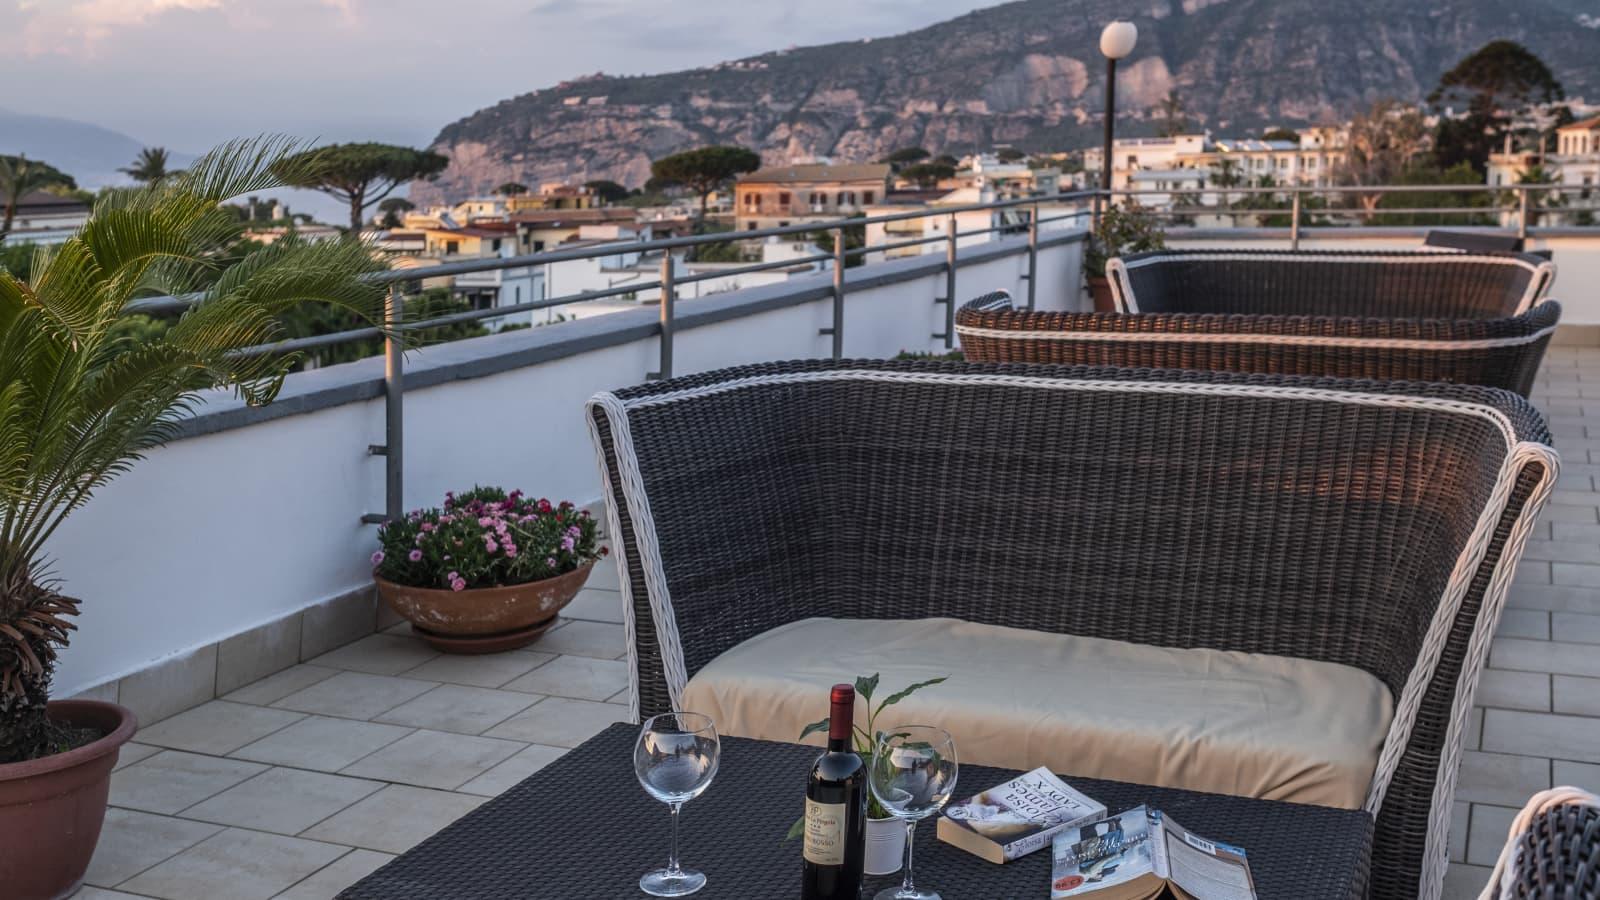 Hotel La Pergola Sorrento Sorrento And Amalfi Coast Summer Holidays Topflight Ie